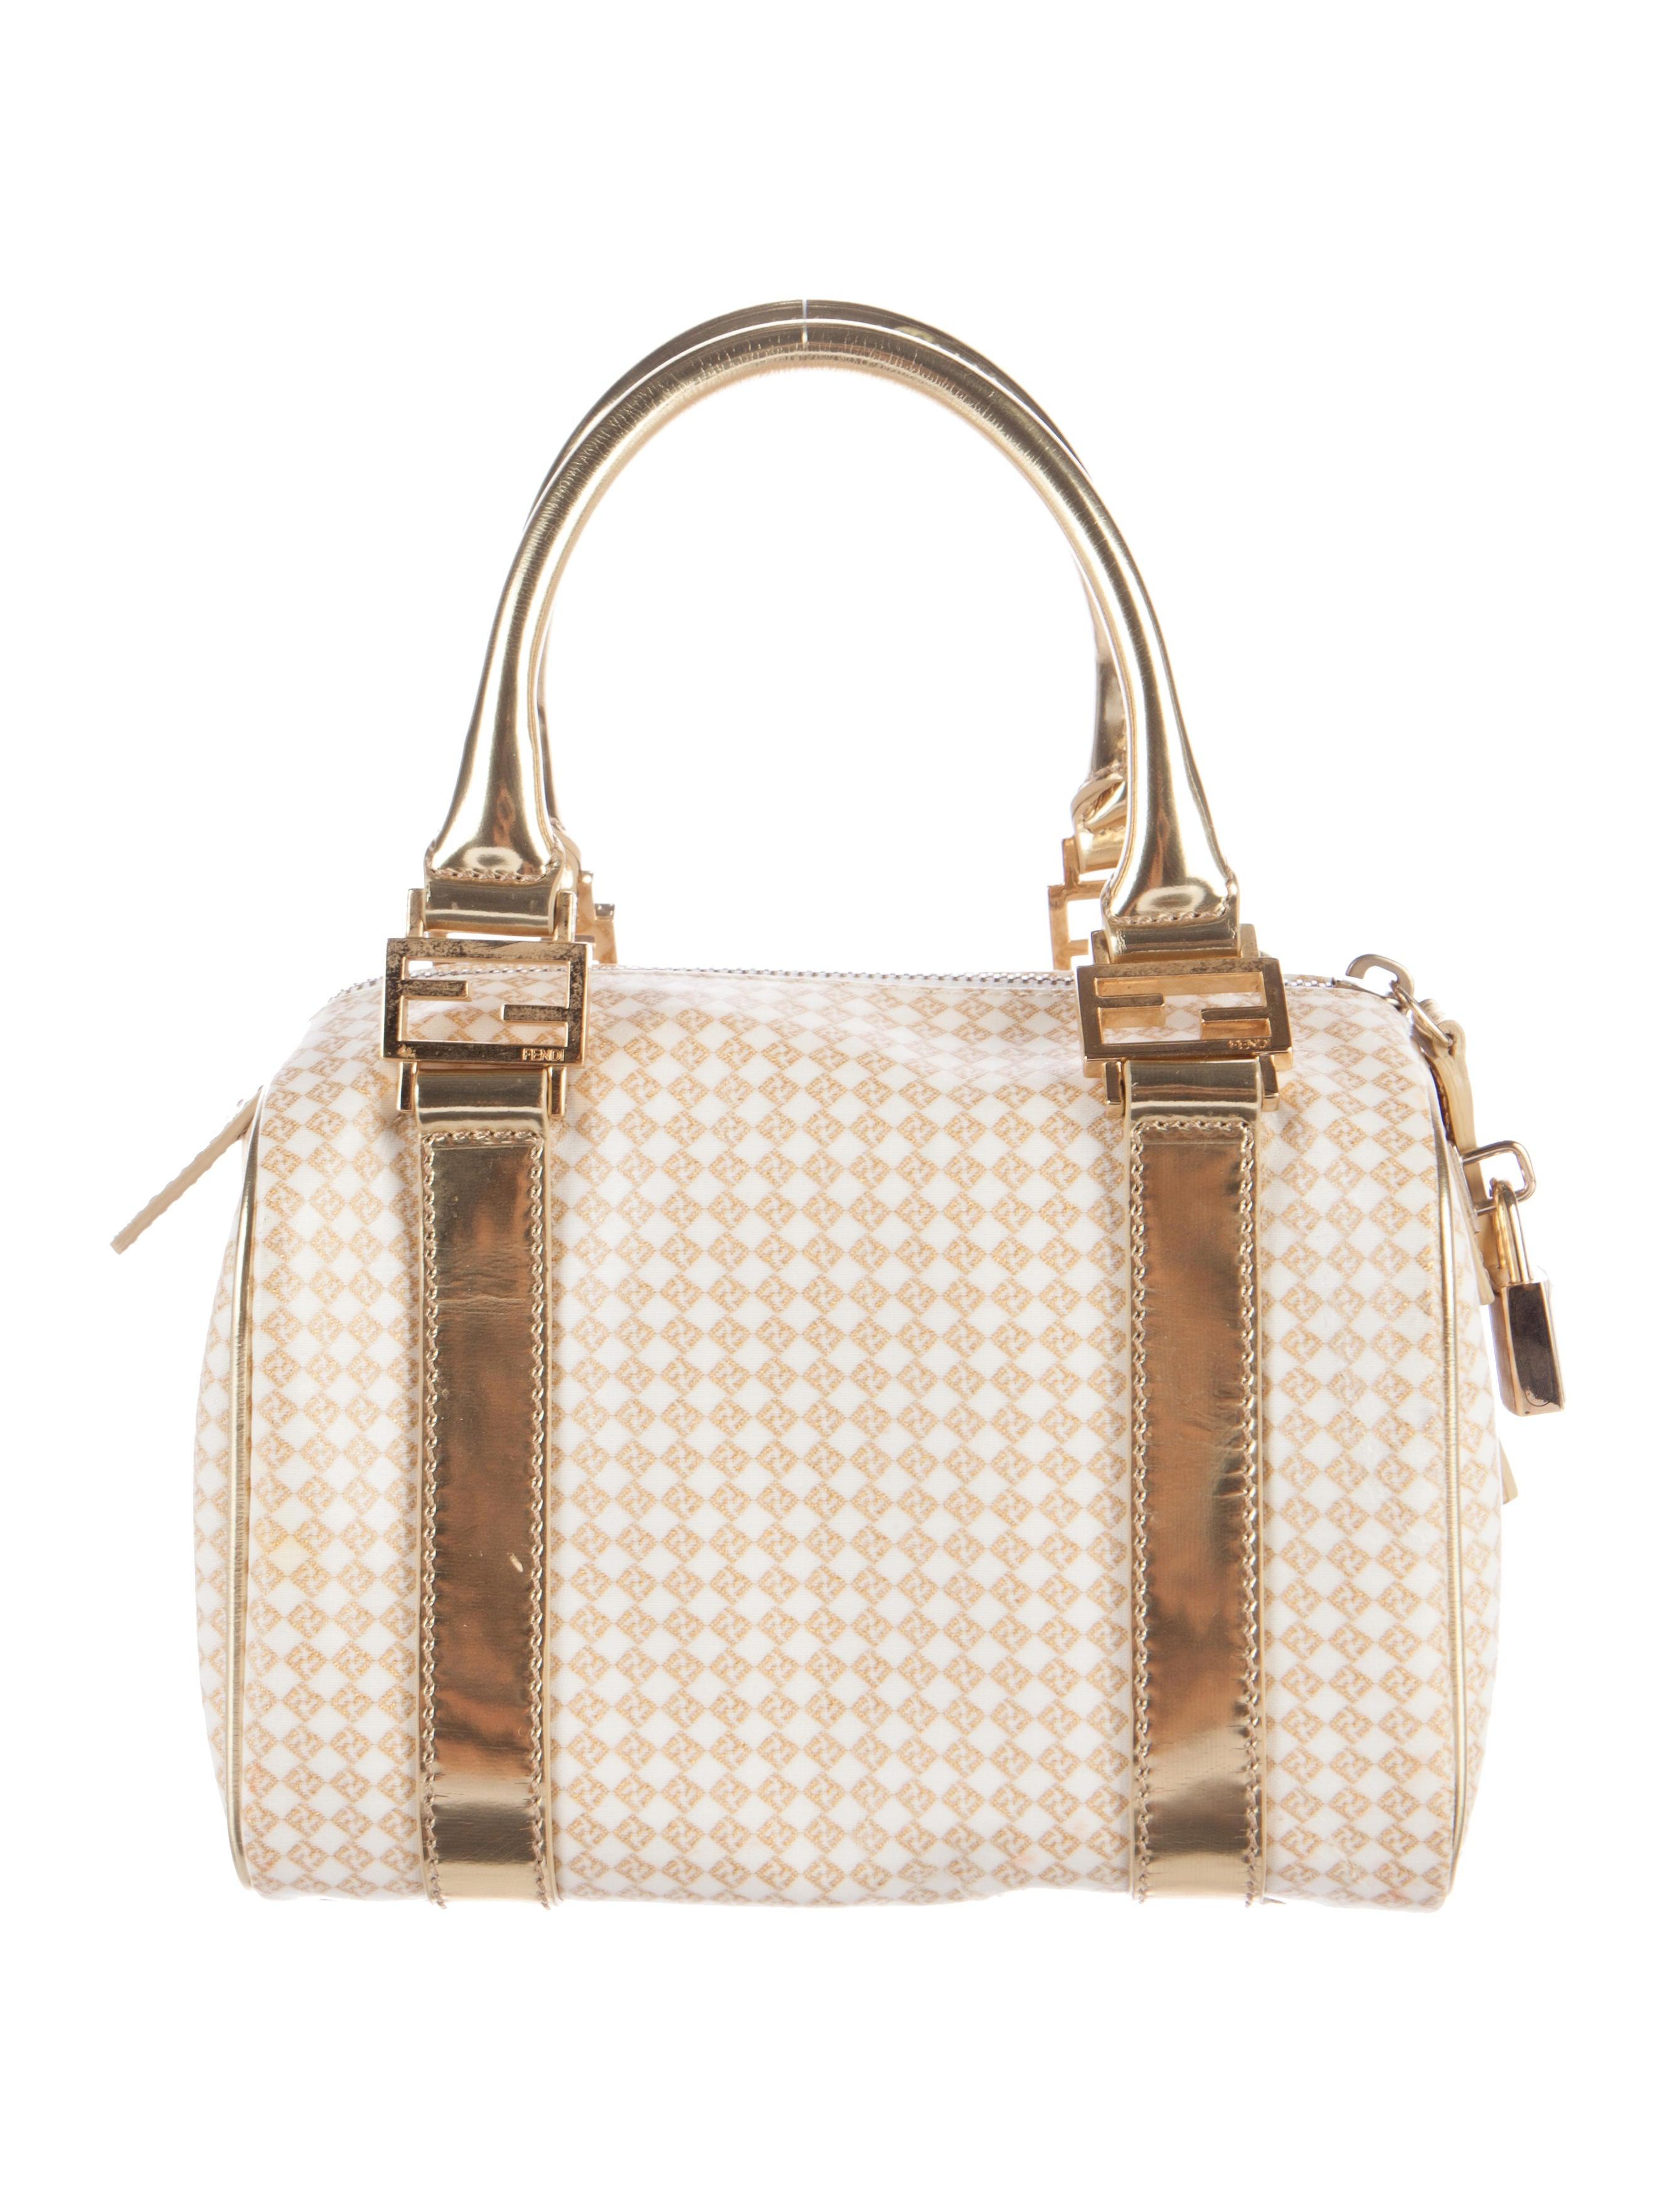 Boston Bag Patchwork Tutorial: Fendi Zucchino Mini Boston Bag - Handbags - FEN56257